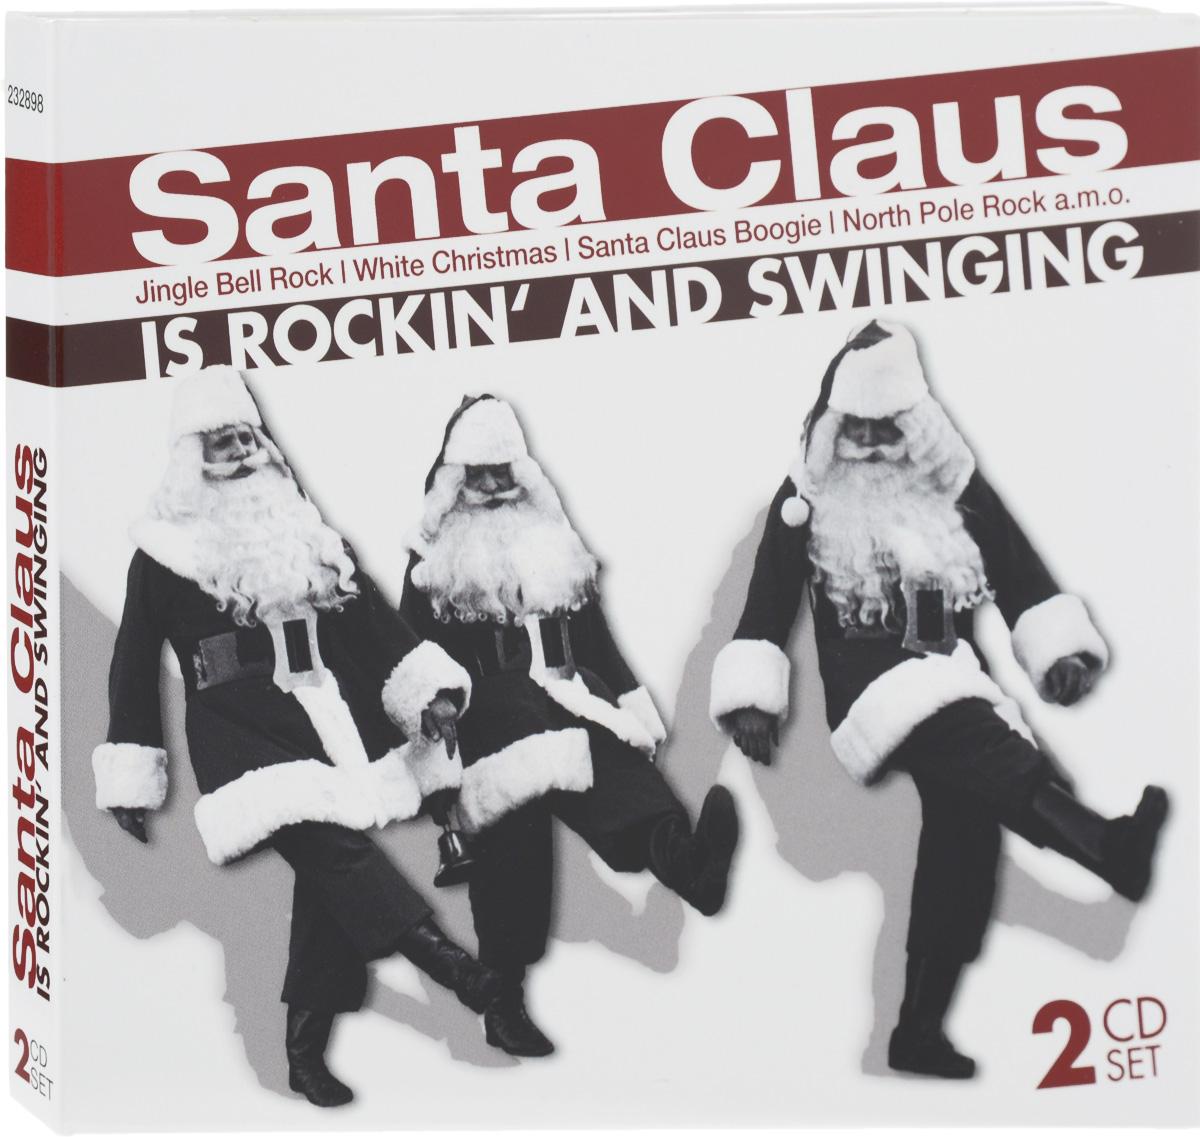 Santa Claus Is Rockin' And Swinging (2 CD) santa claus letter print wall art tapestry